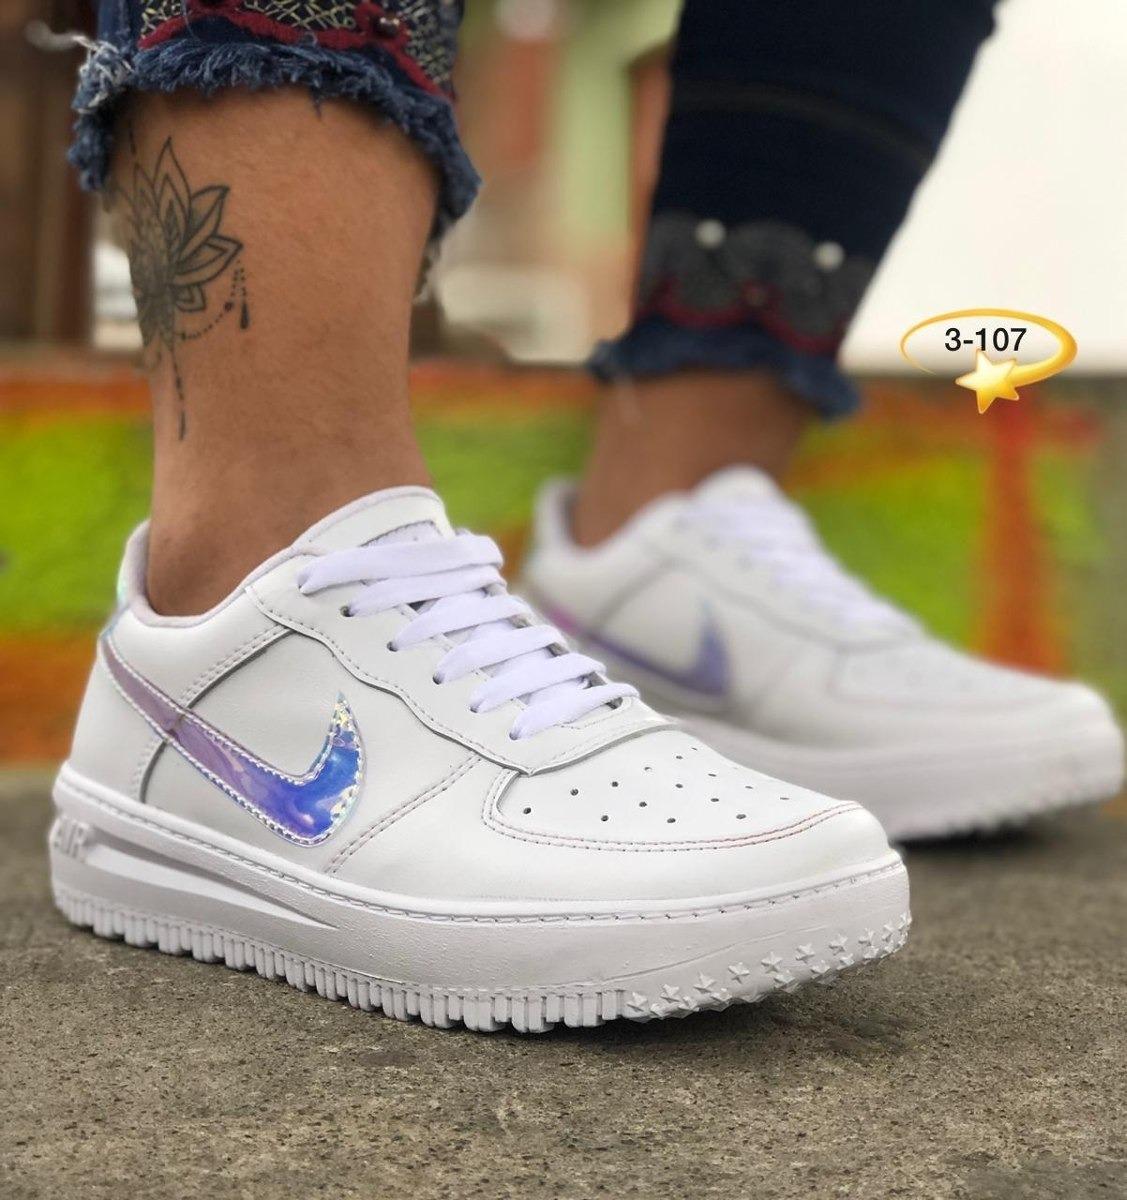 Tenis Deportivo Nike Arcoiris Para Dama,oferta, Envío Gratis